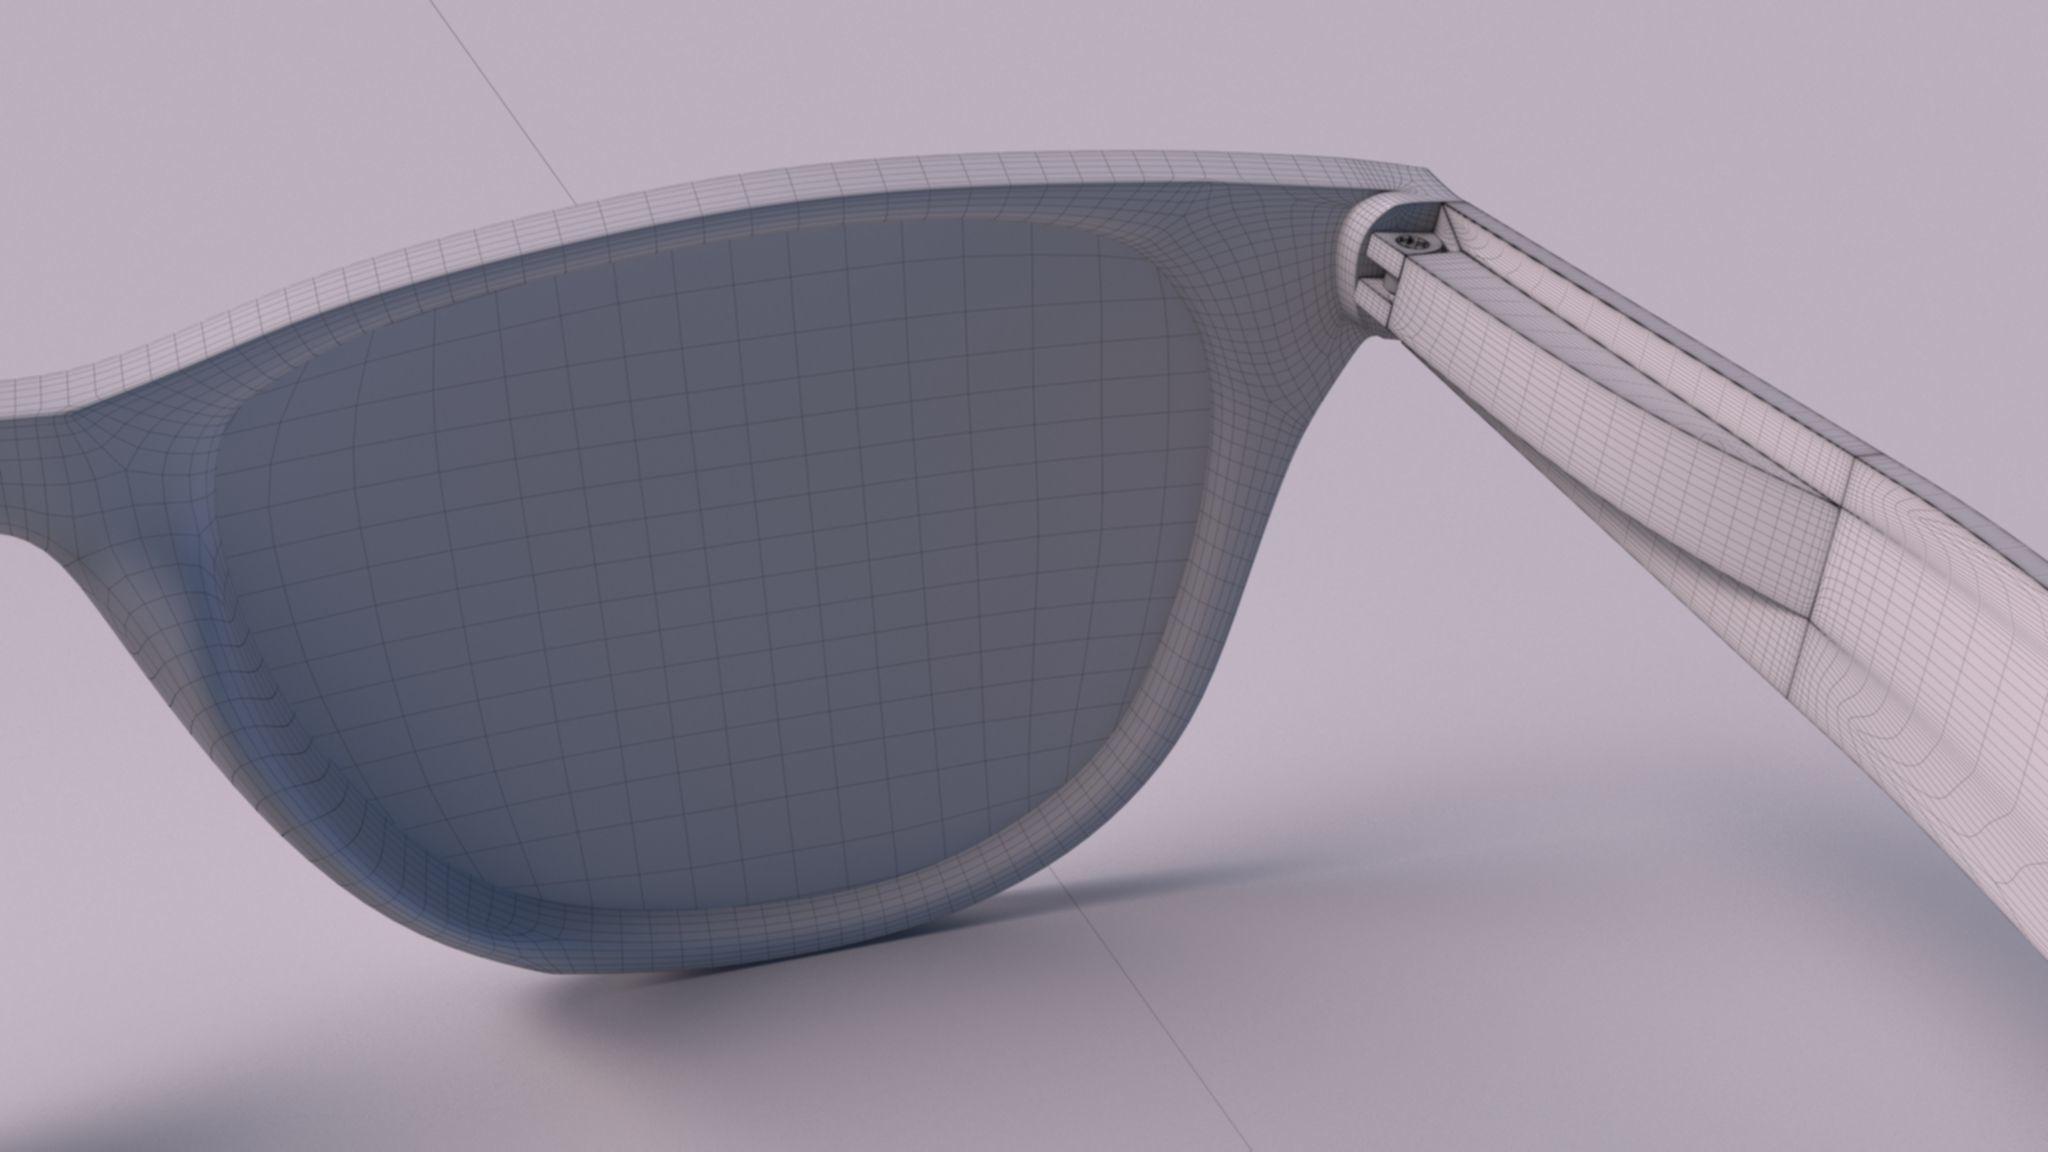 ddfd908550 ... ray ban wayfarer 3d model max obj mtl fbx 8 ...